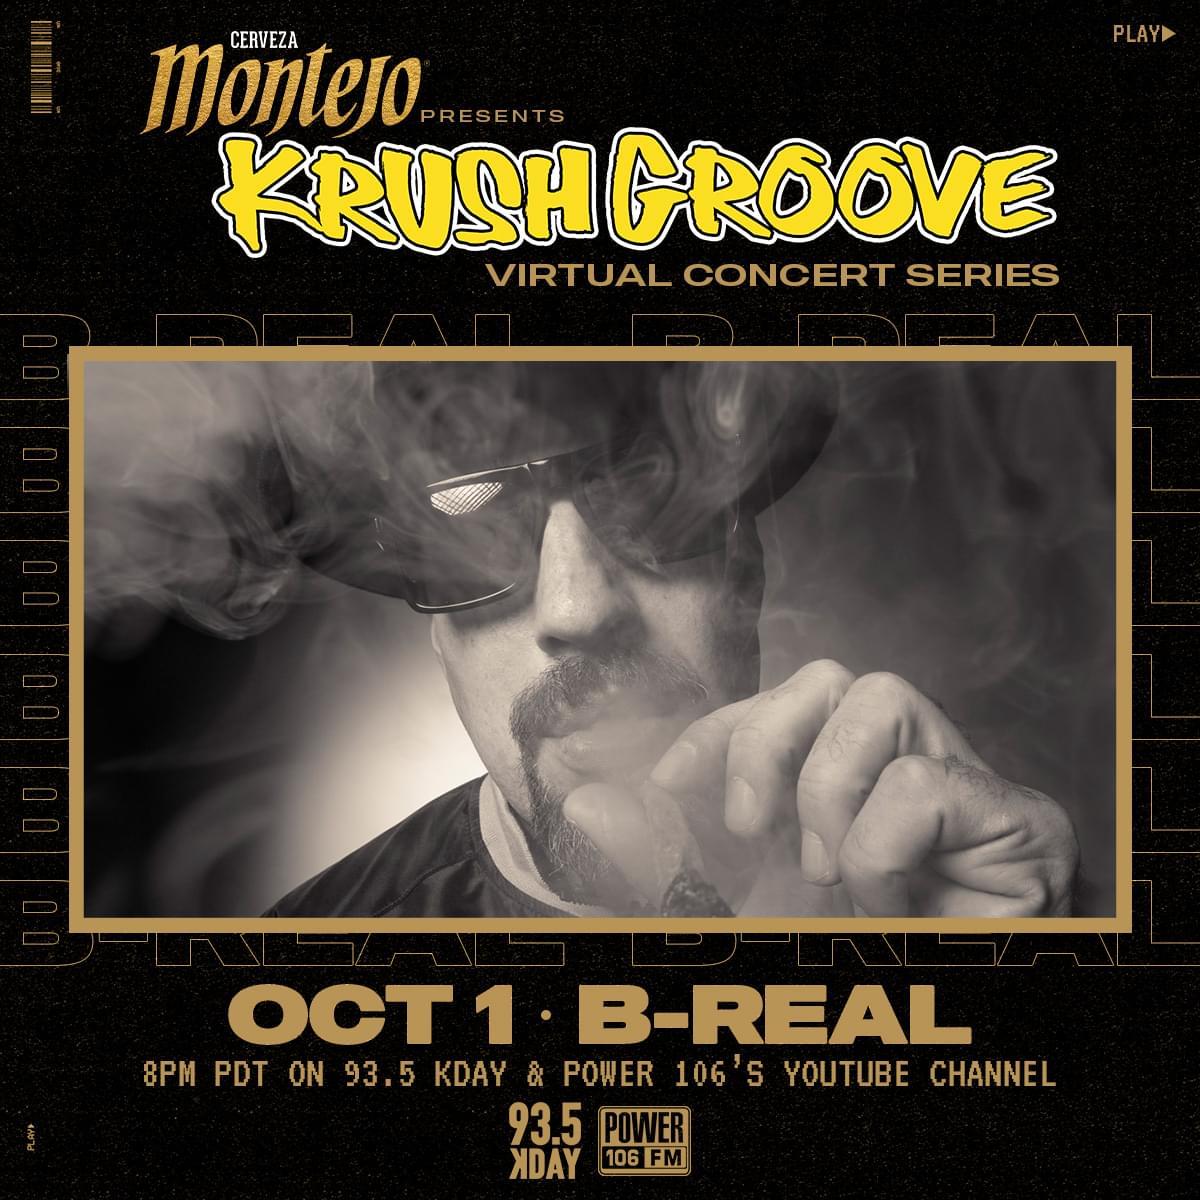 Krush Groove Virtual Concert Series